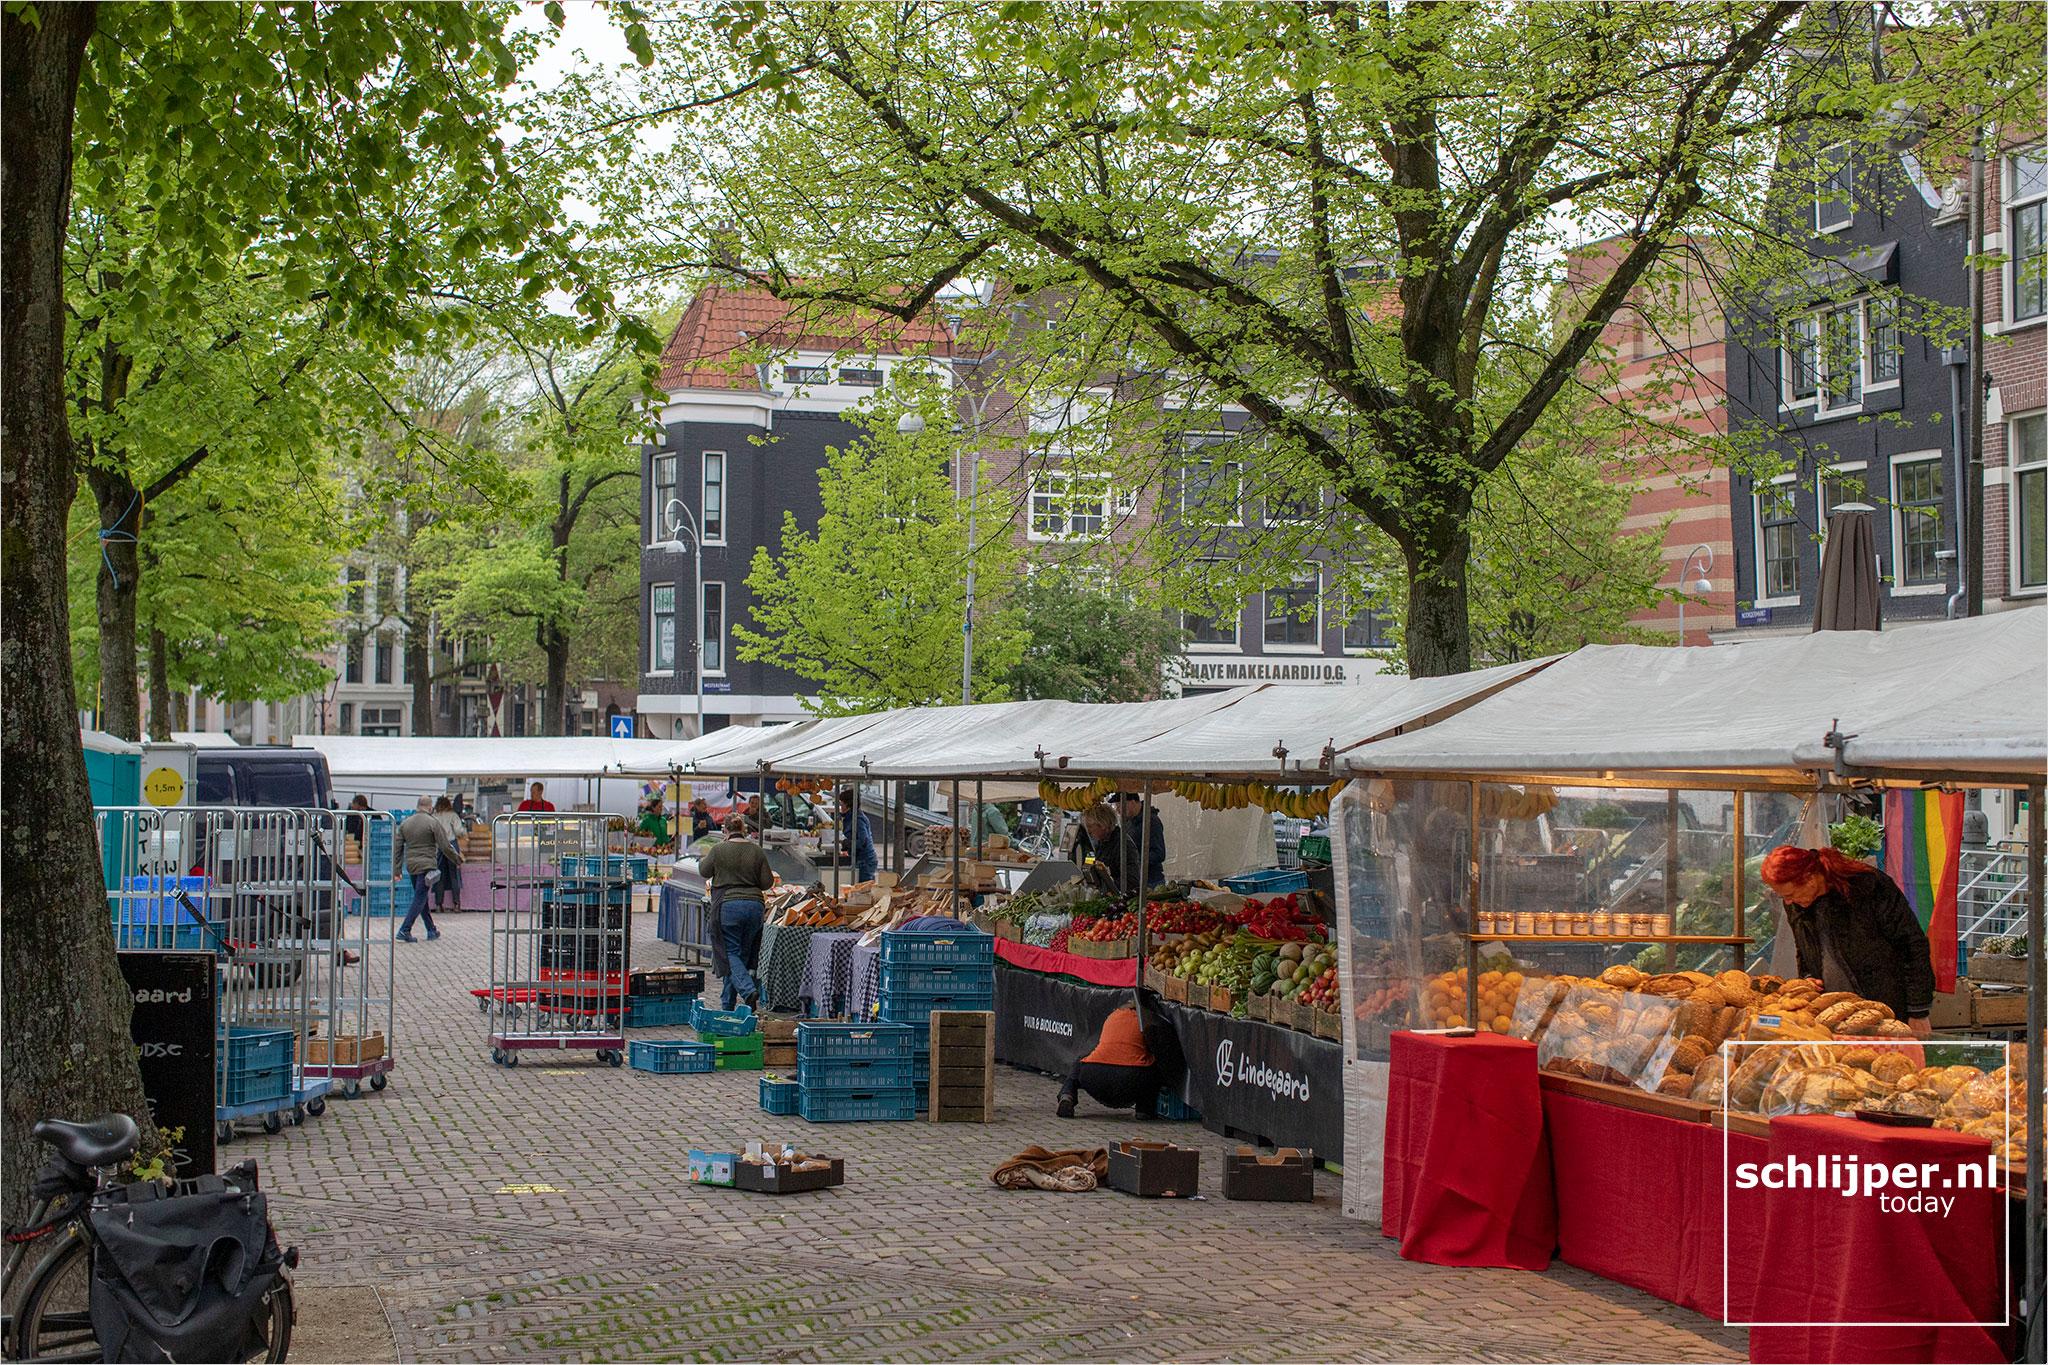 The Netherlands, Amsterdam, 15 mei 2021